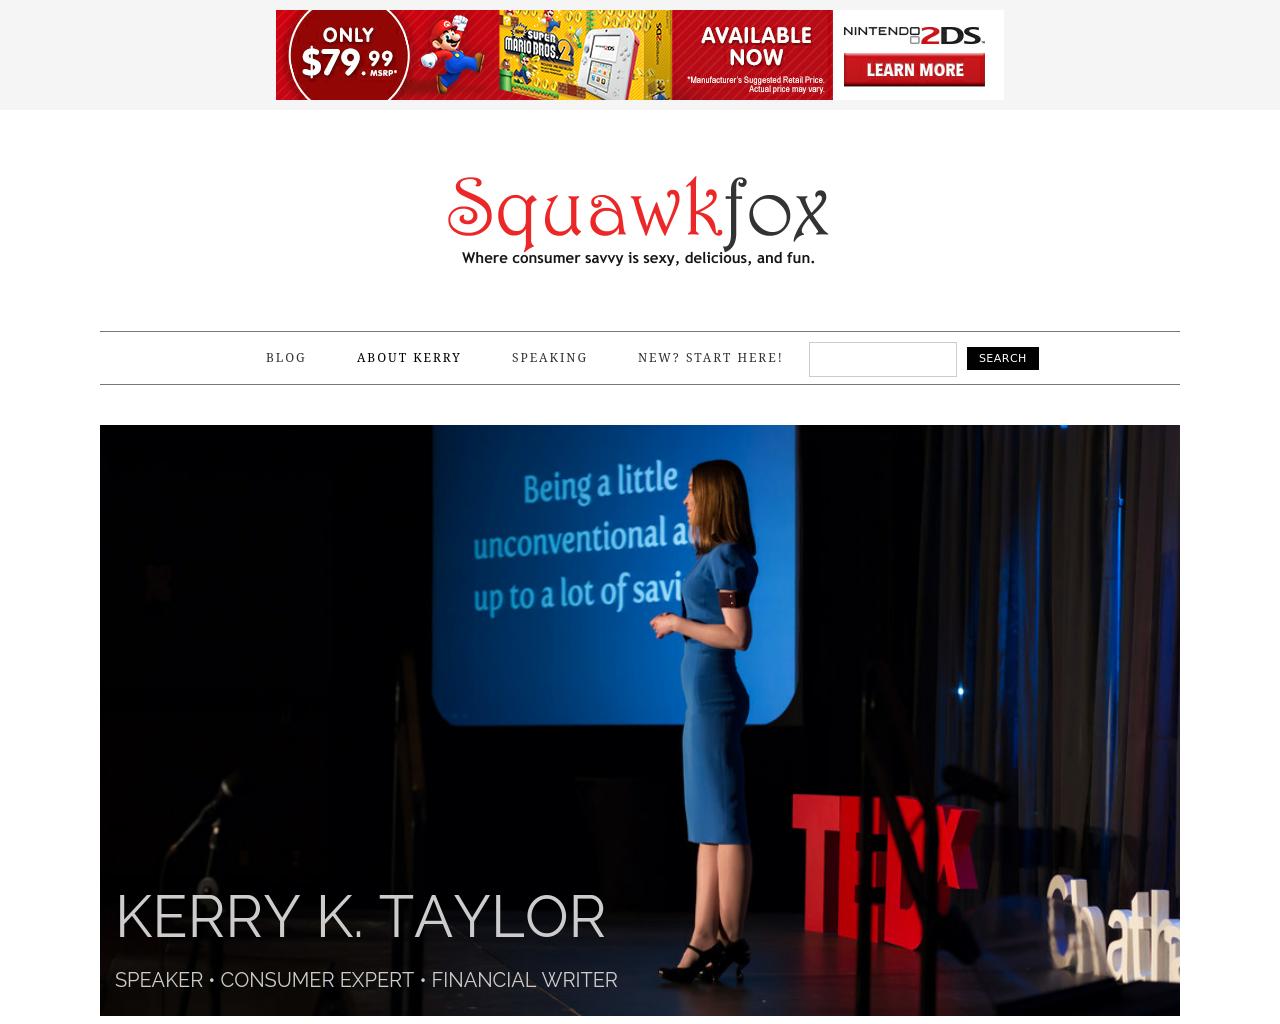 Squawkfox-Advertising-Reviews-Pricing